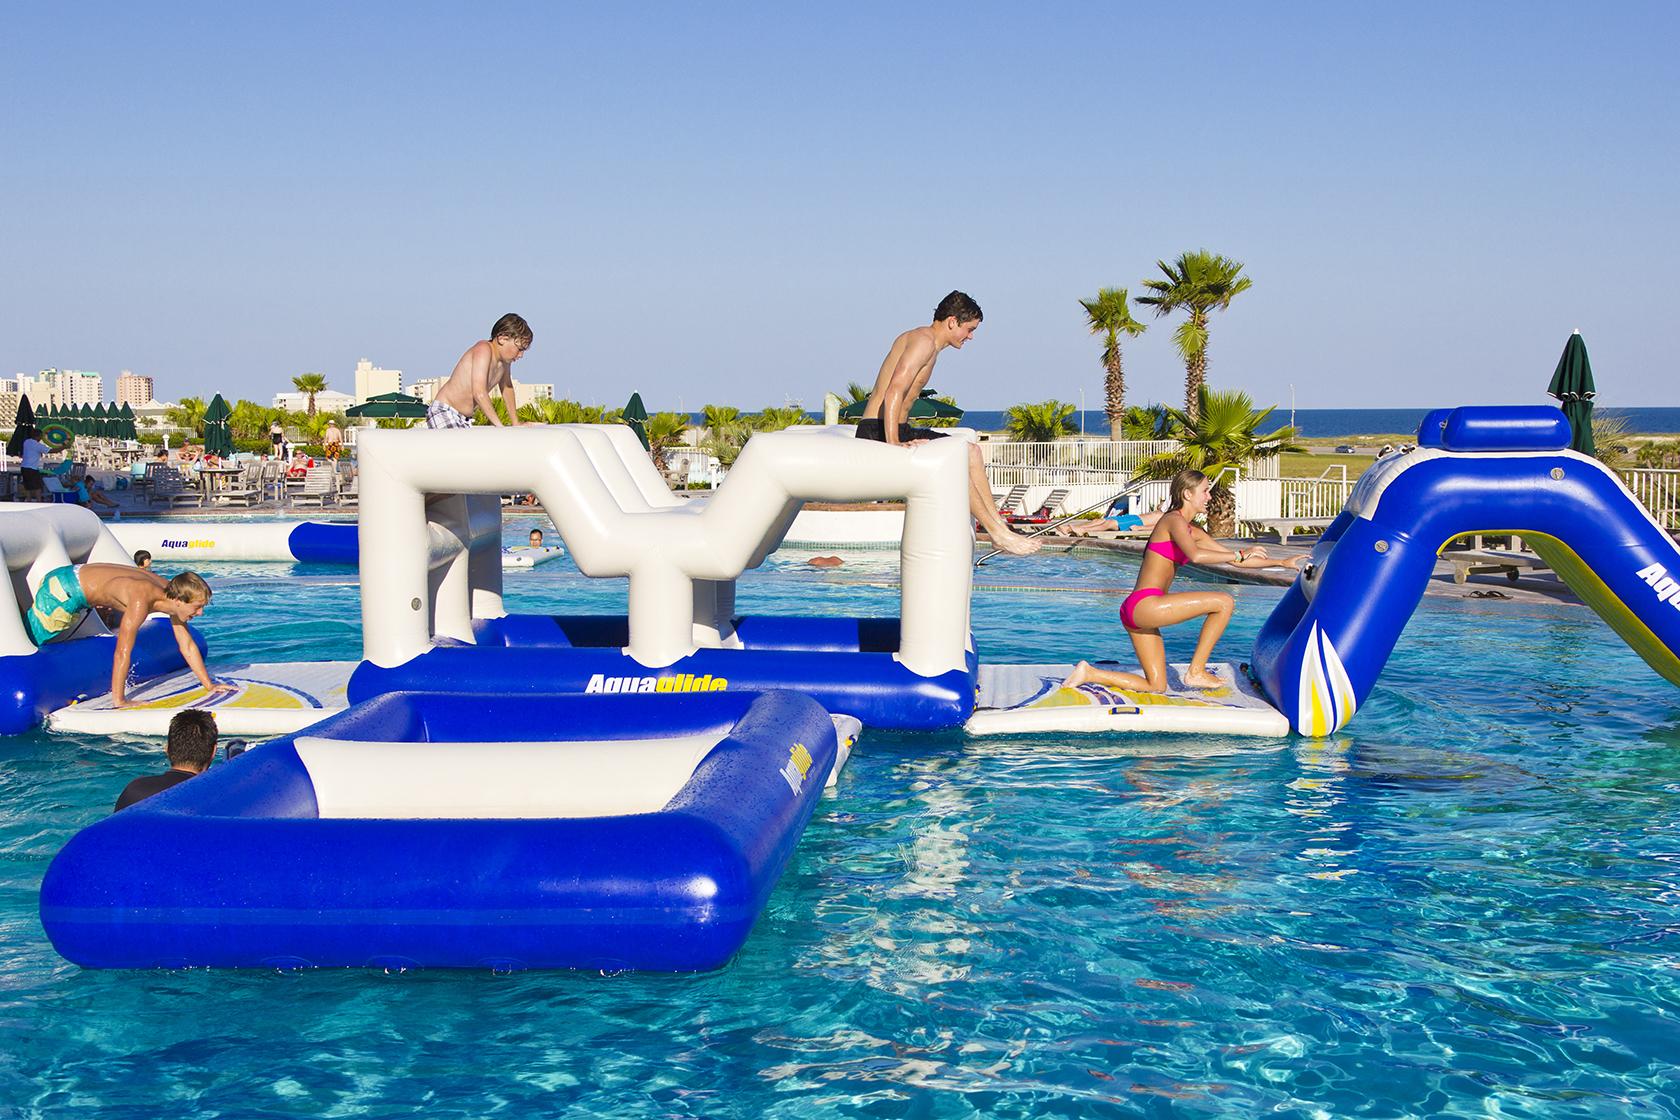 5ee6182e9 Aquaglide Vista™ - Commercial Recreation Specialists